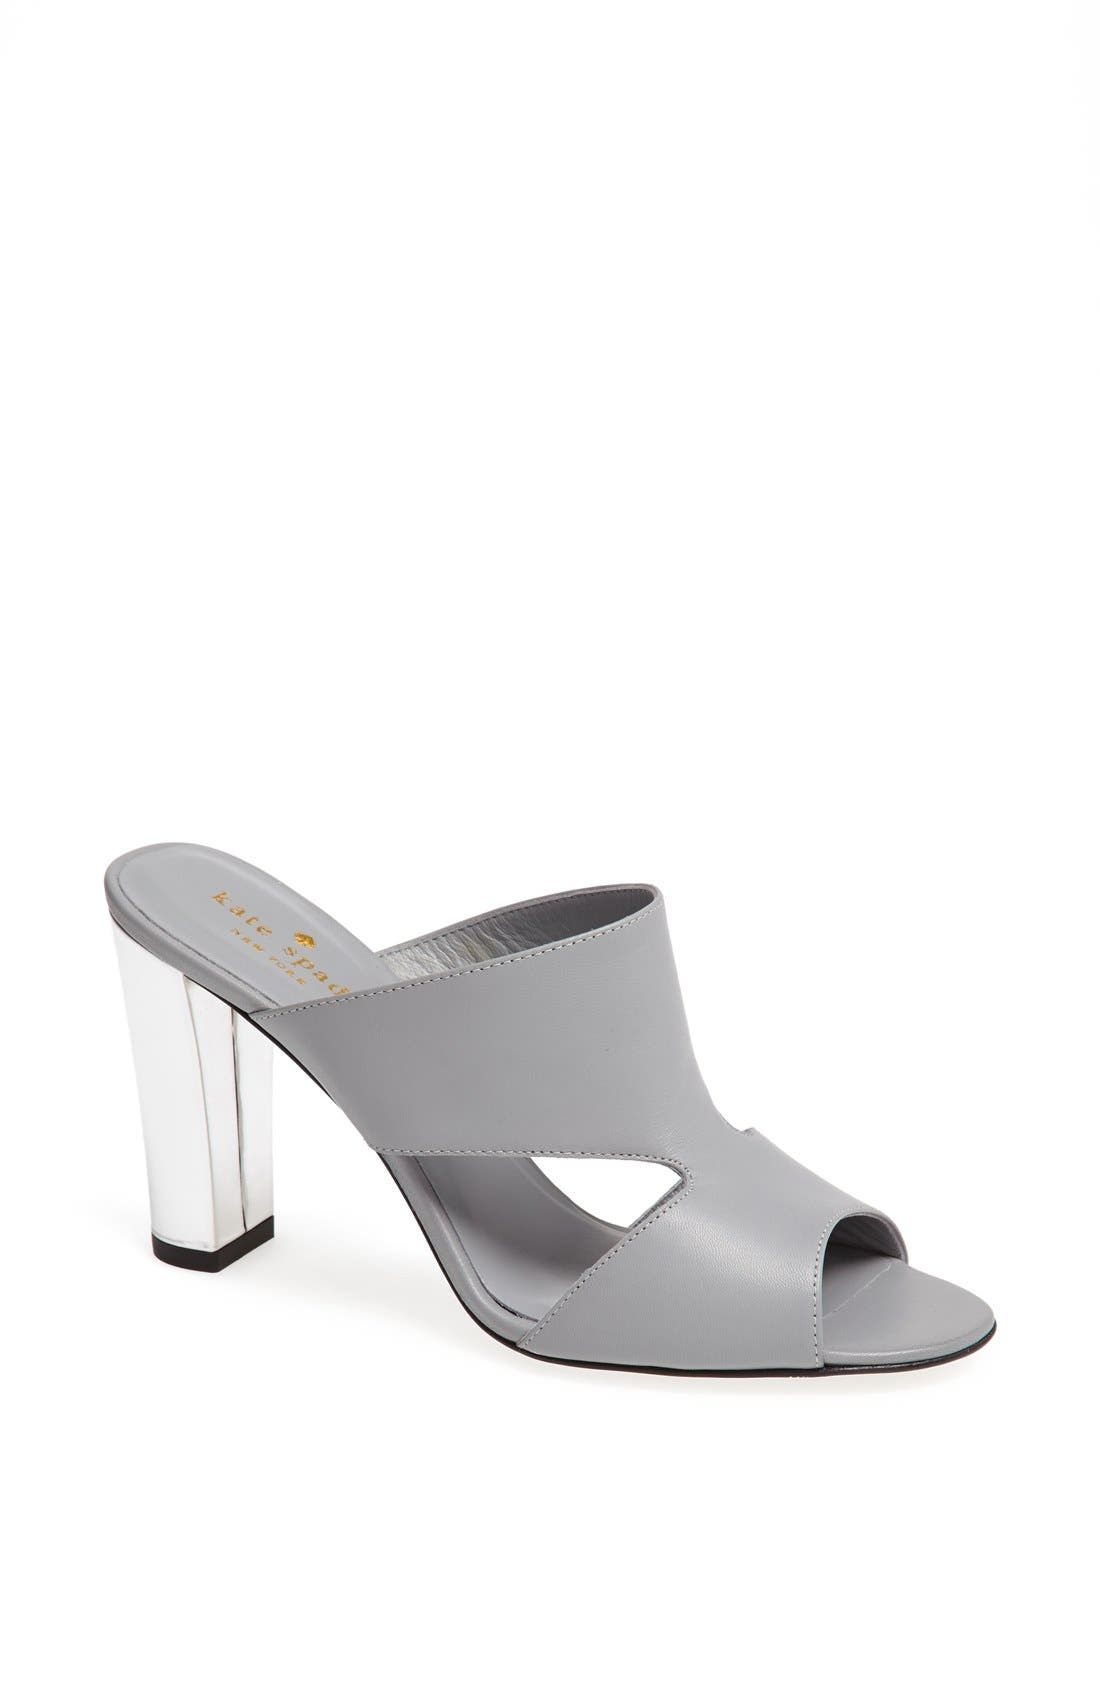 Main Image - kate spade new york 'iberia' sandal